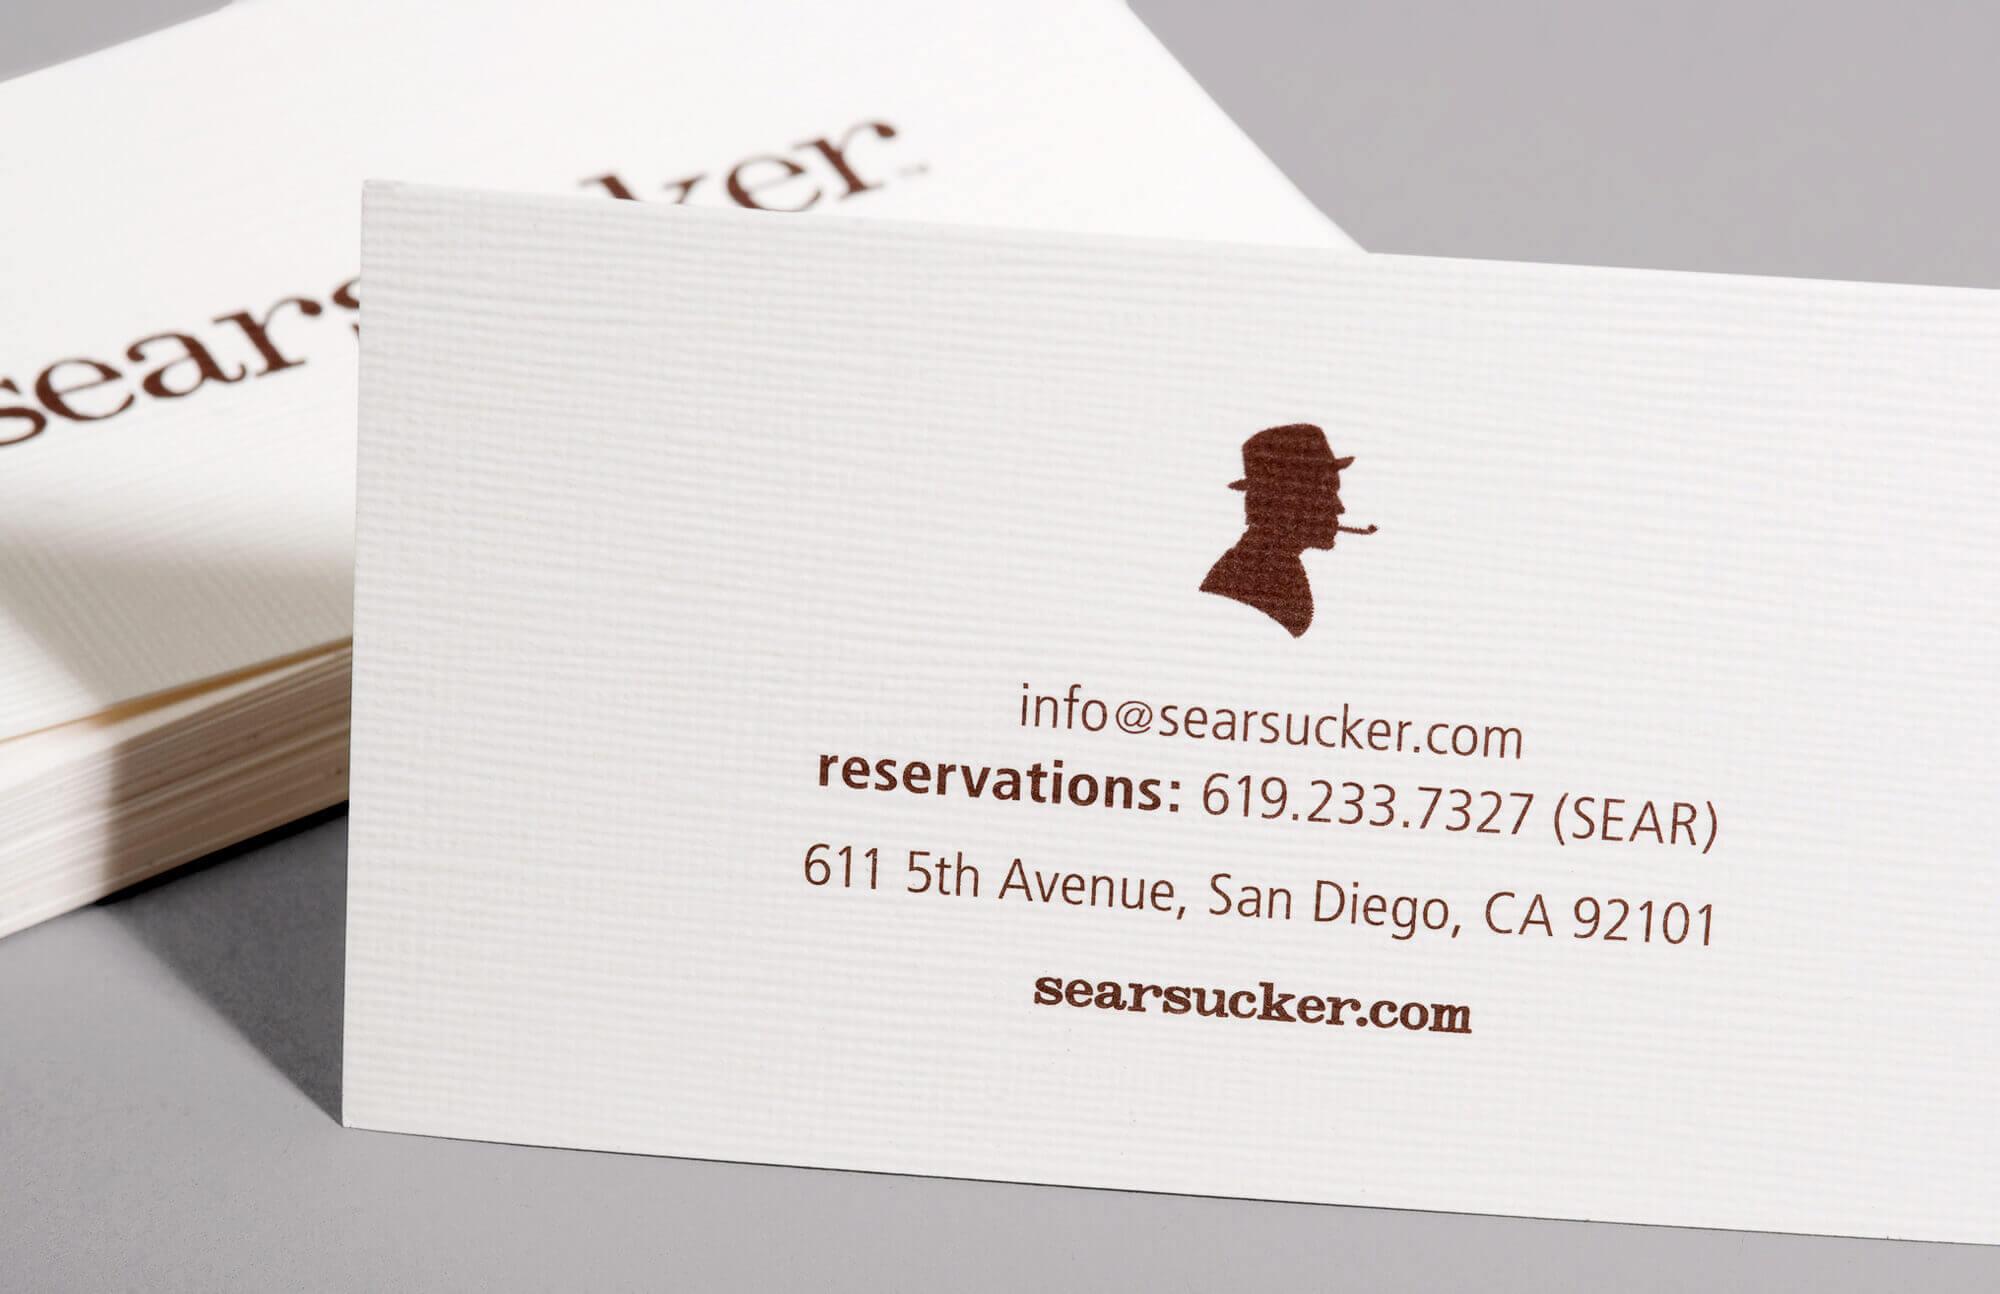 SEARSUCKER-BUSINESS-CARD-BACK